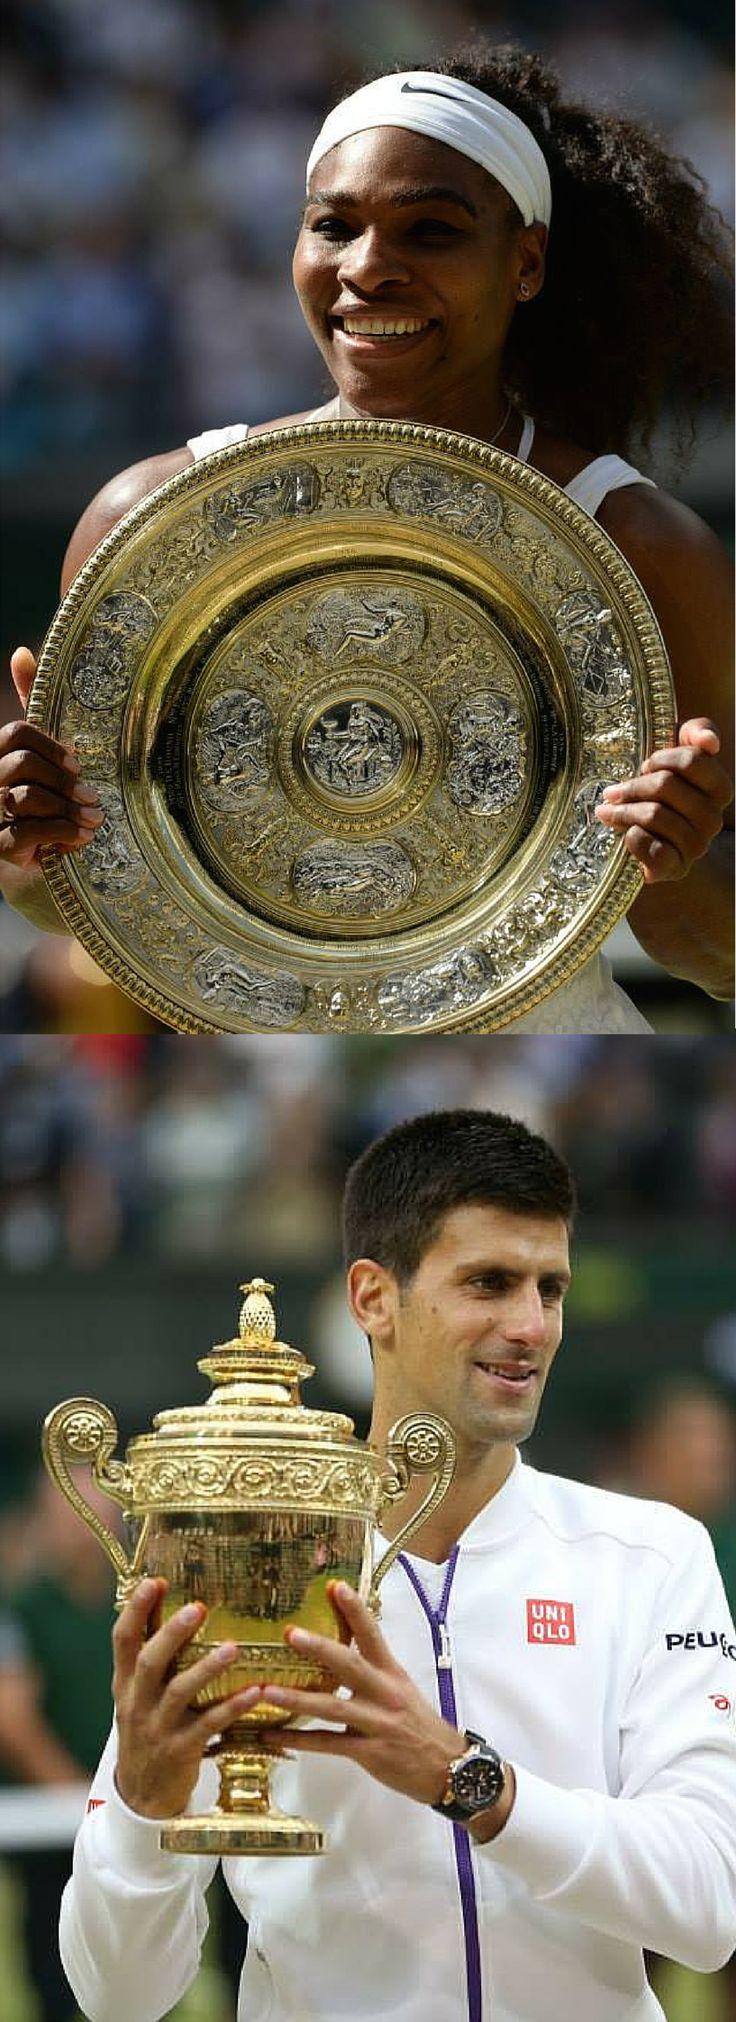 Congratulations to the 2015 Wimbledon Singles Champions, Serena Williams and Novak Djokovic!